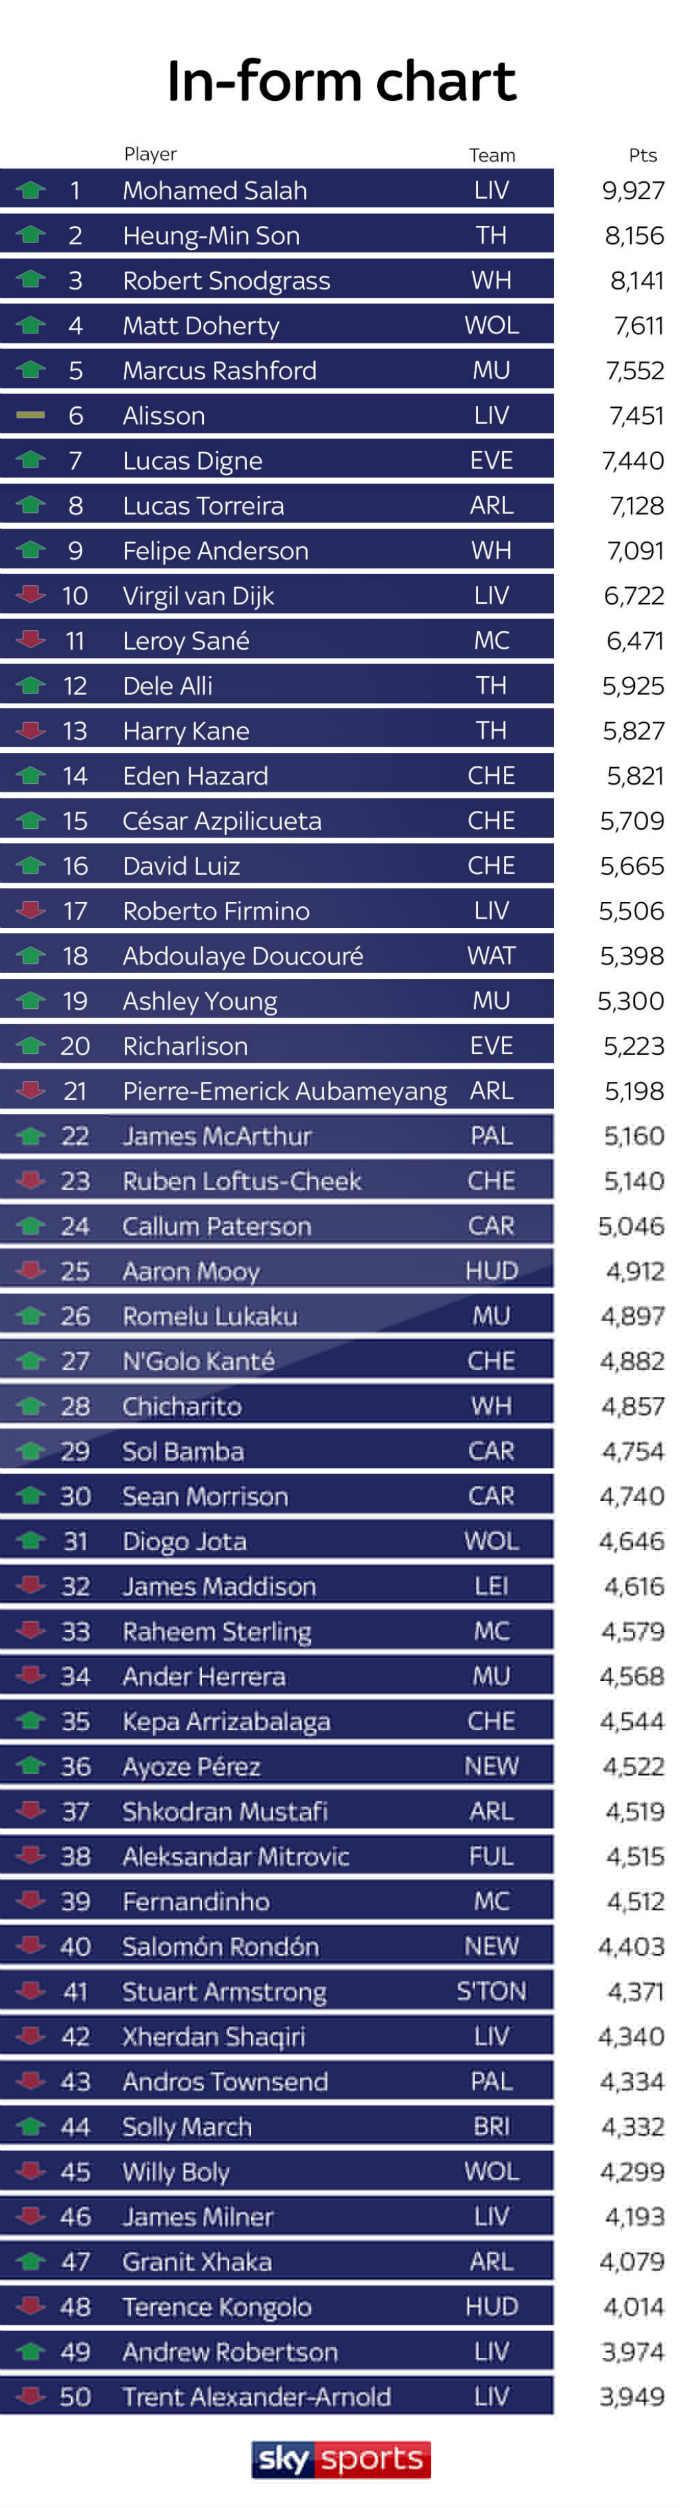 Premier League Power Rankings